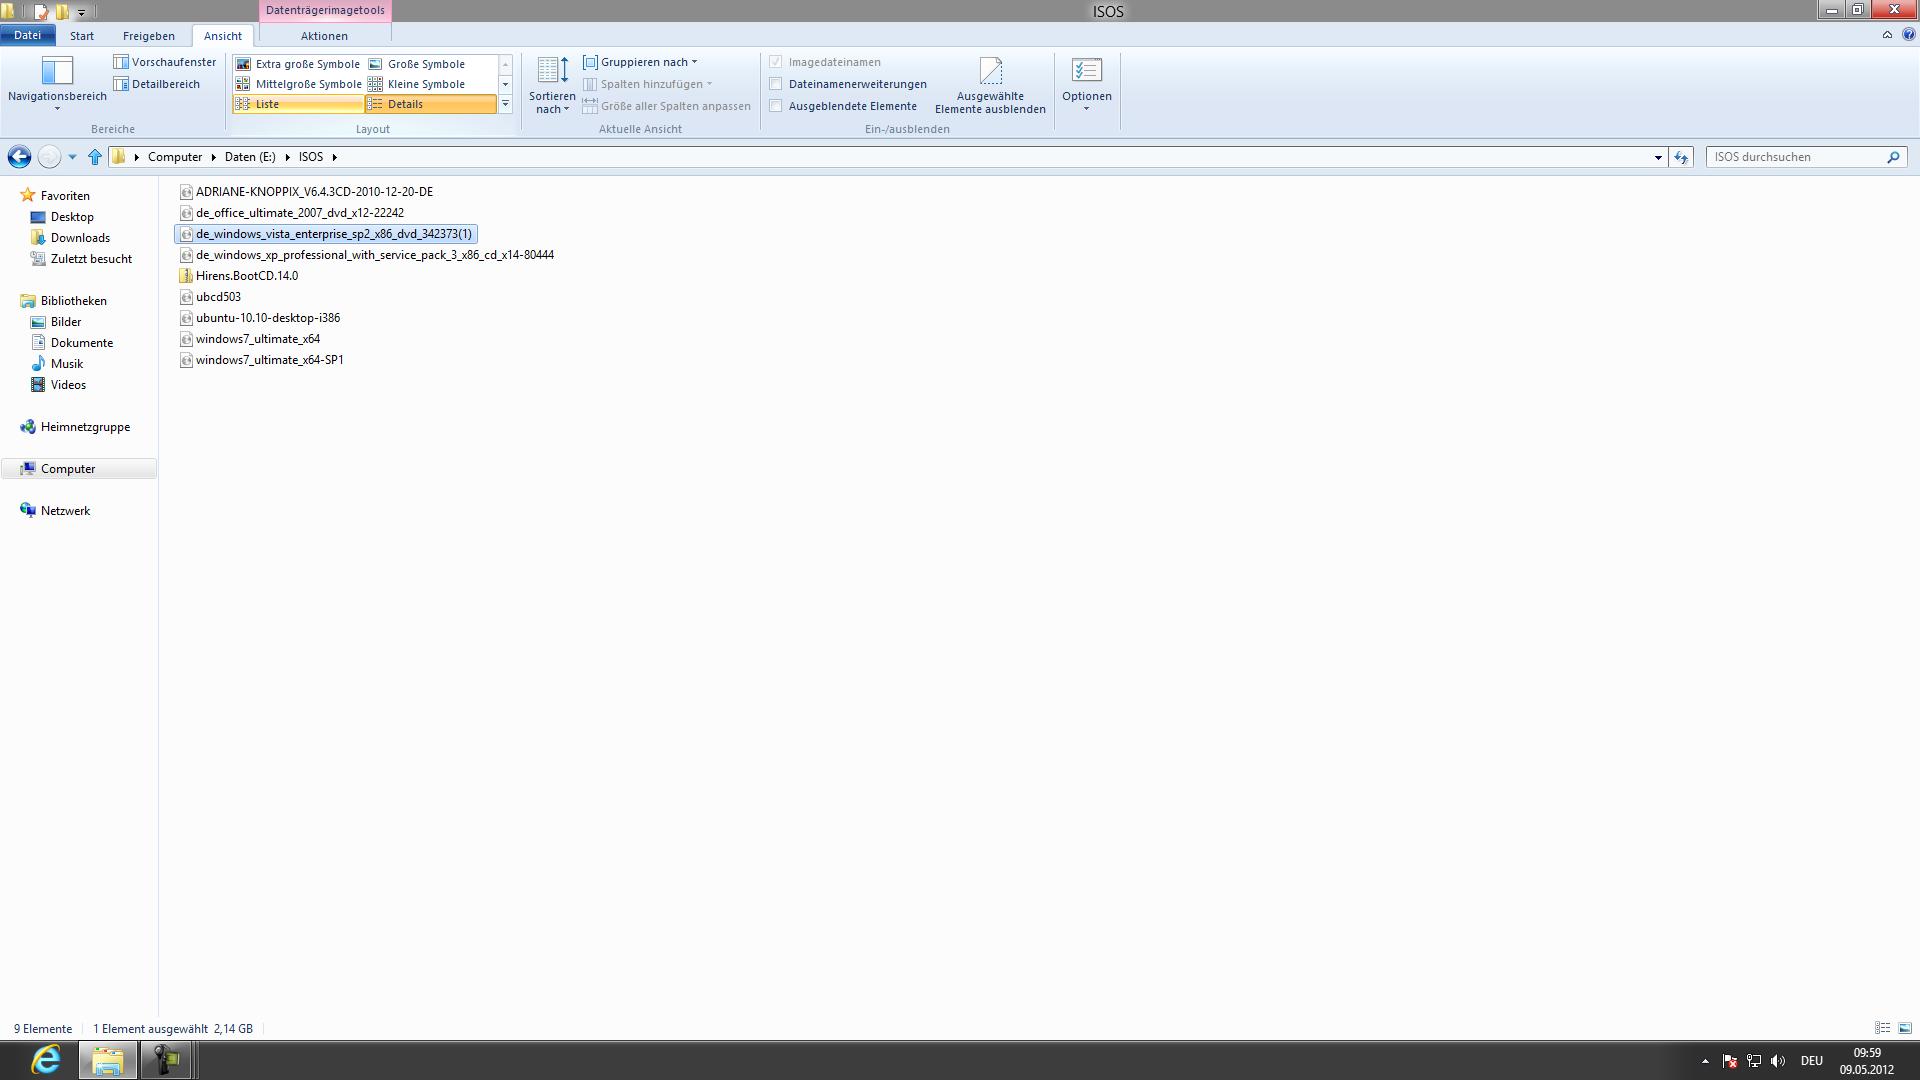 03-windows-8-ribbon-datei-explorer-ansicht-470.png?nocache=1337078295680